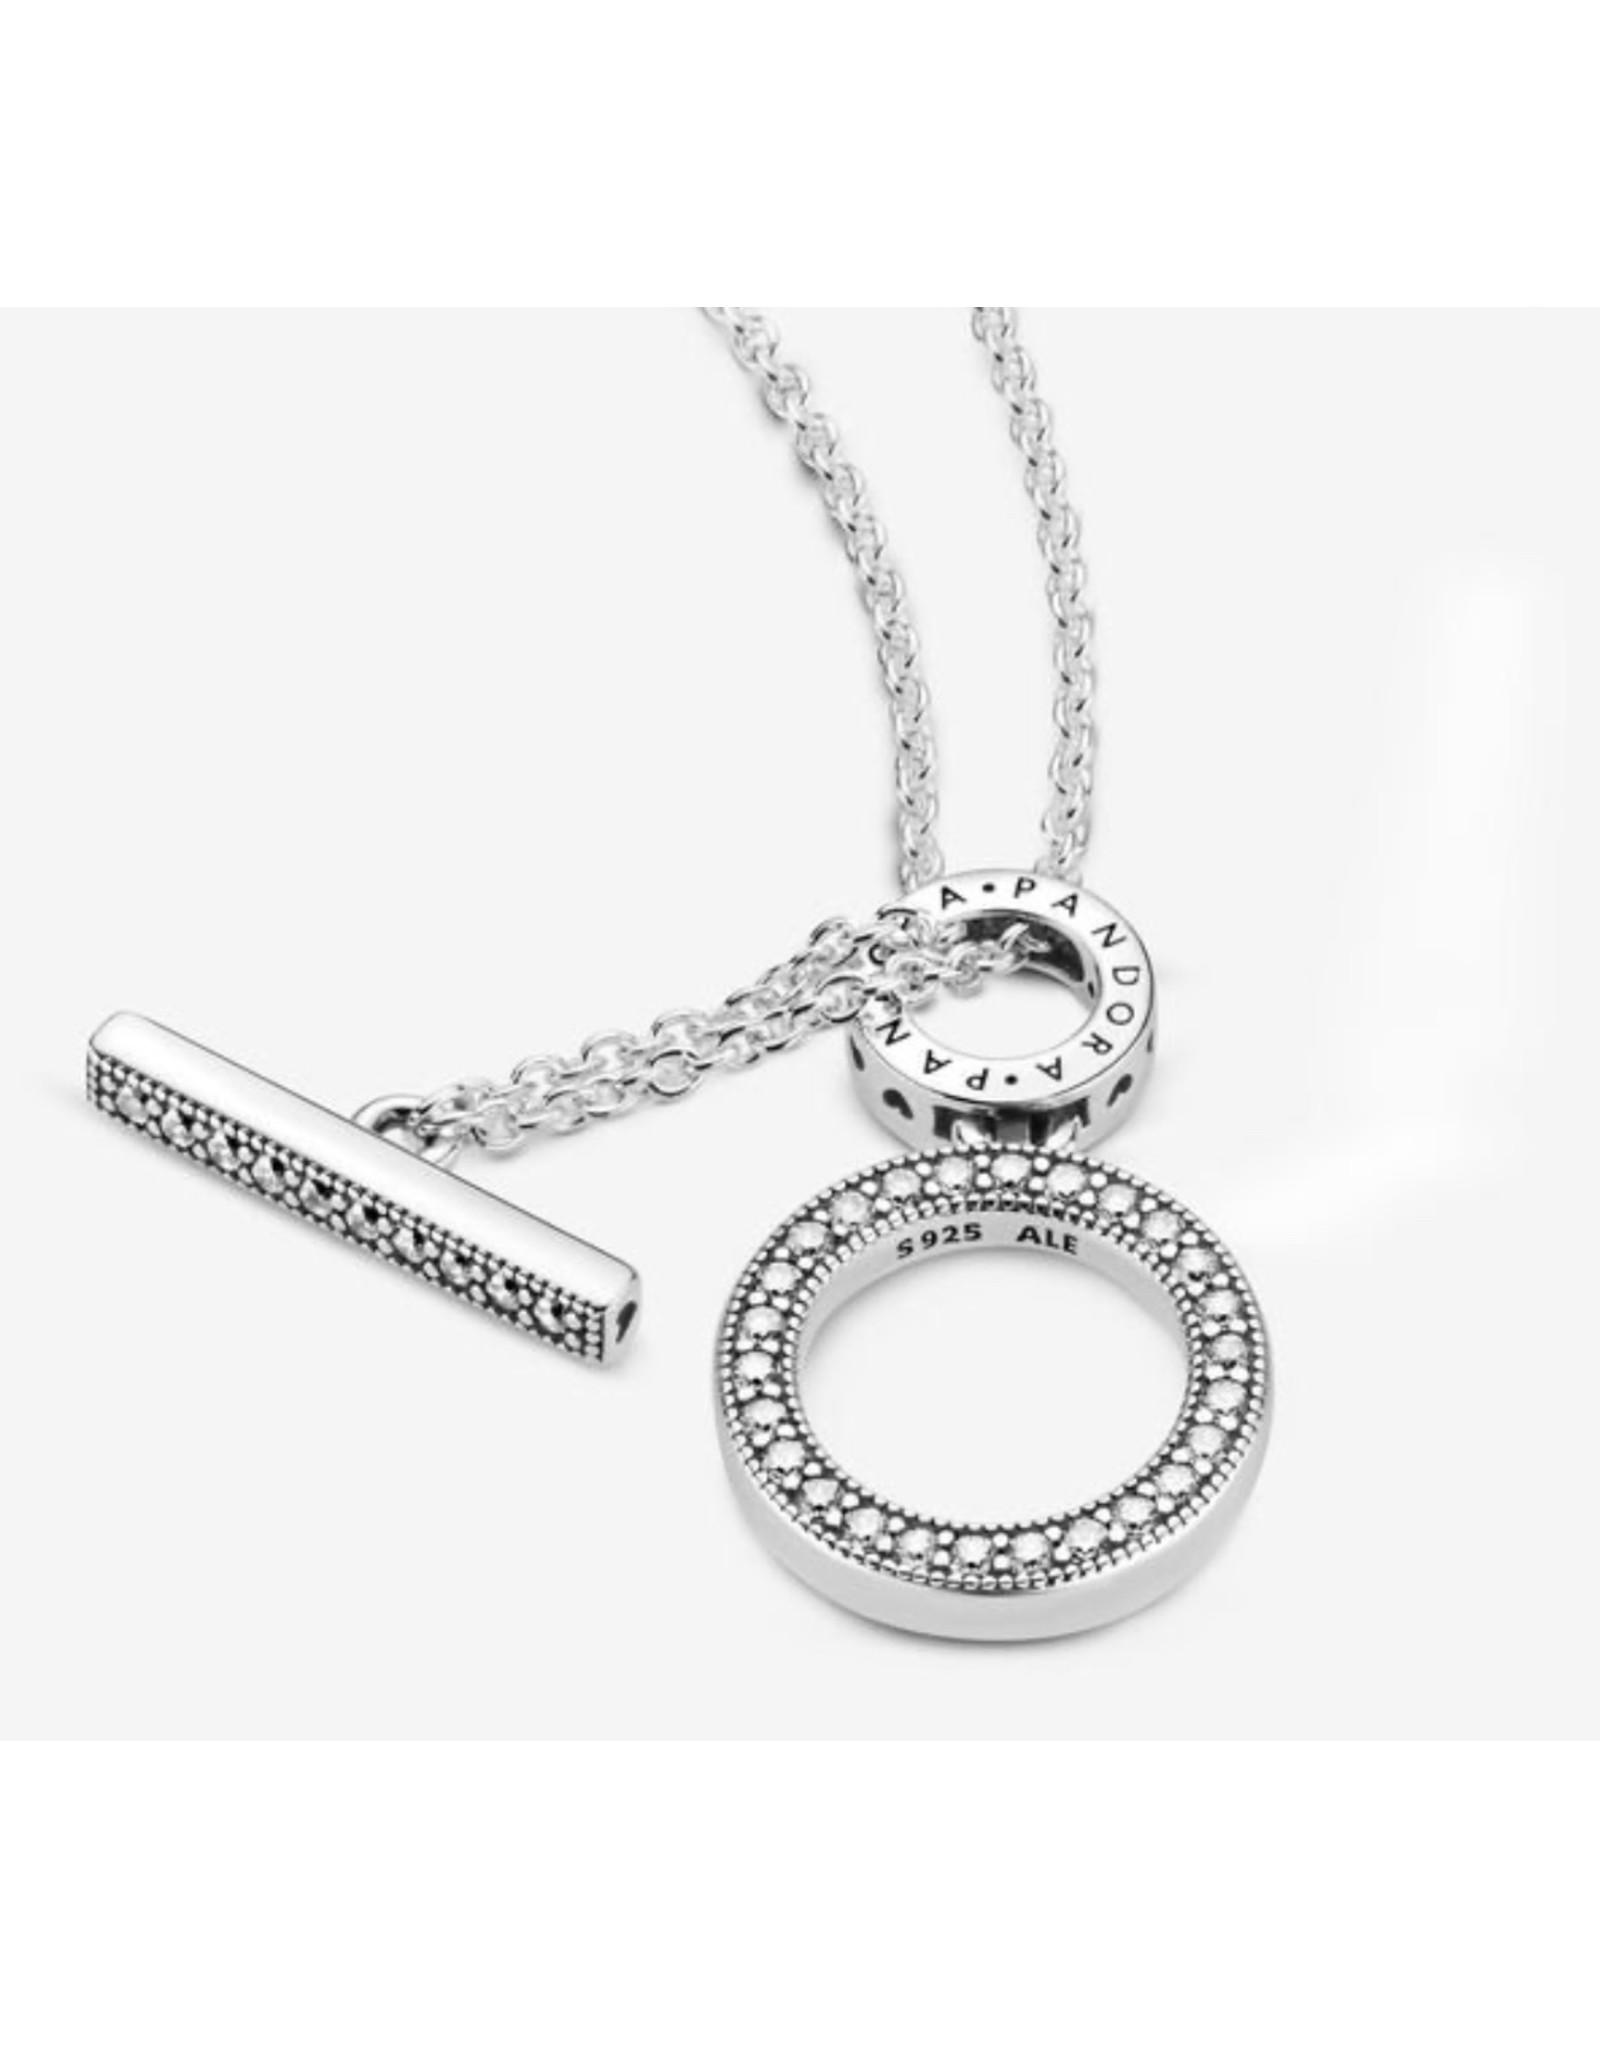 Pandora Pandora Necklace, 399039C01/45, Sterling Silver CZ / 45 cm